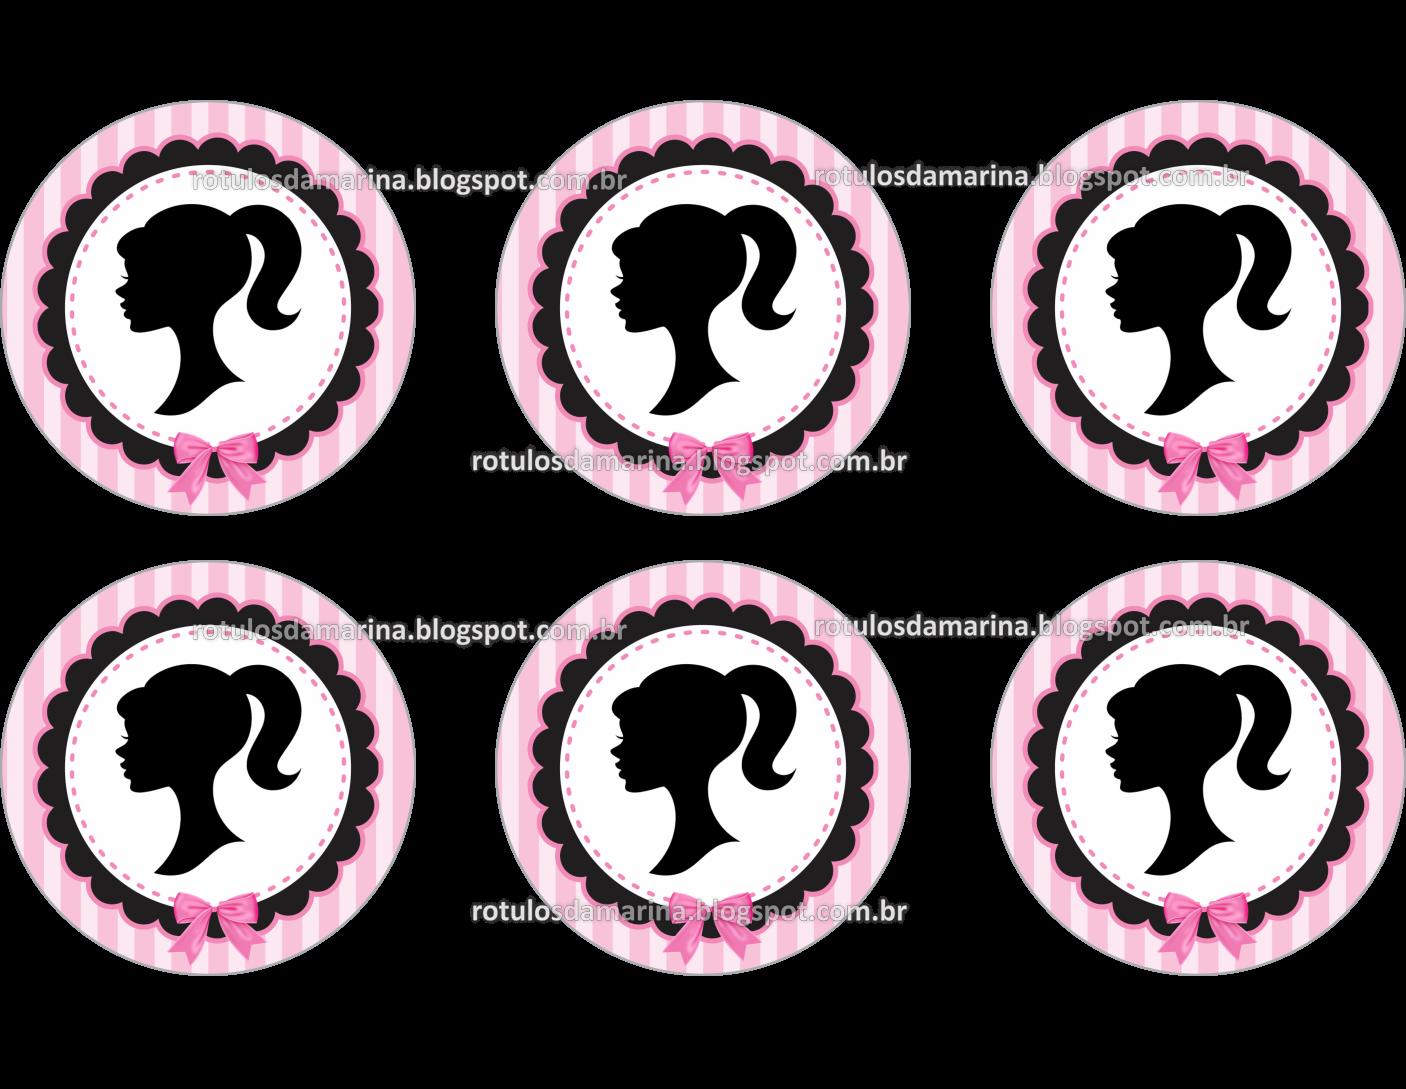 Adesivo De Mesversario Para Imprimir ~ Marina Rótulos Barbie Rosa e Preto